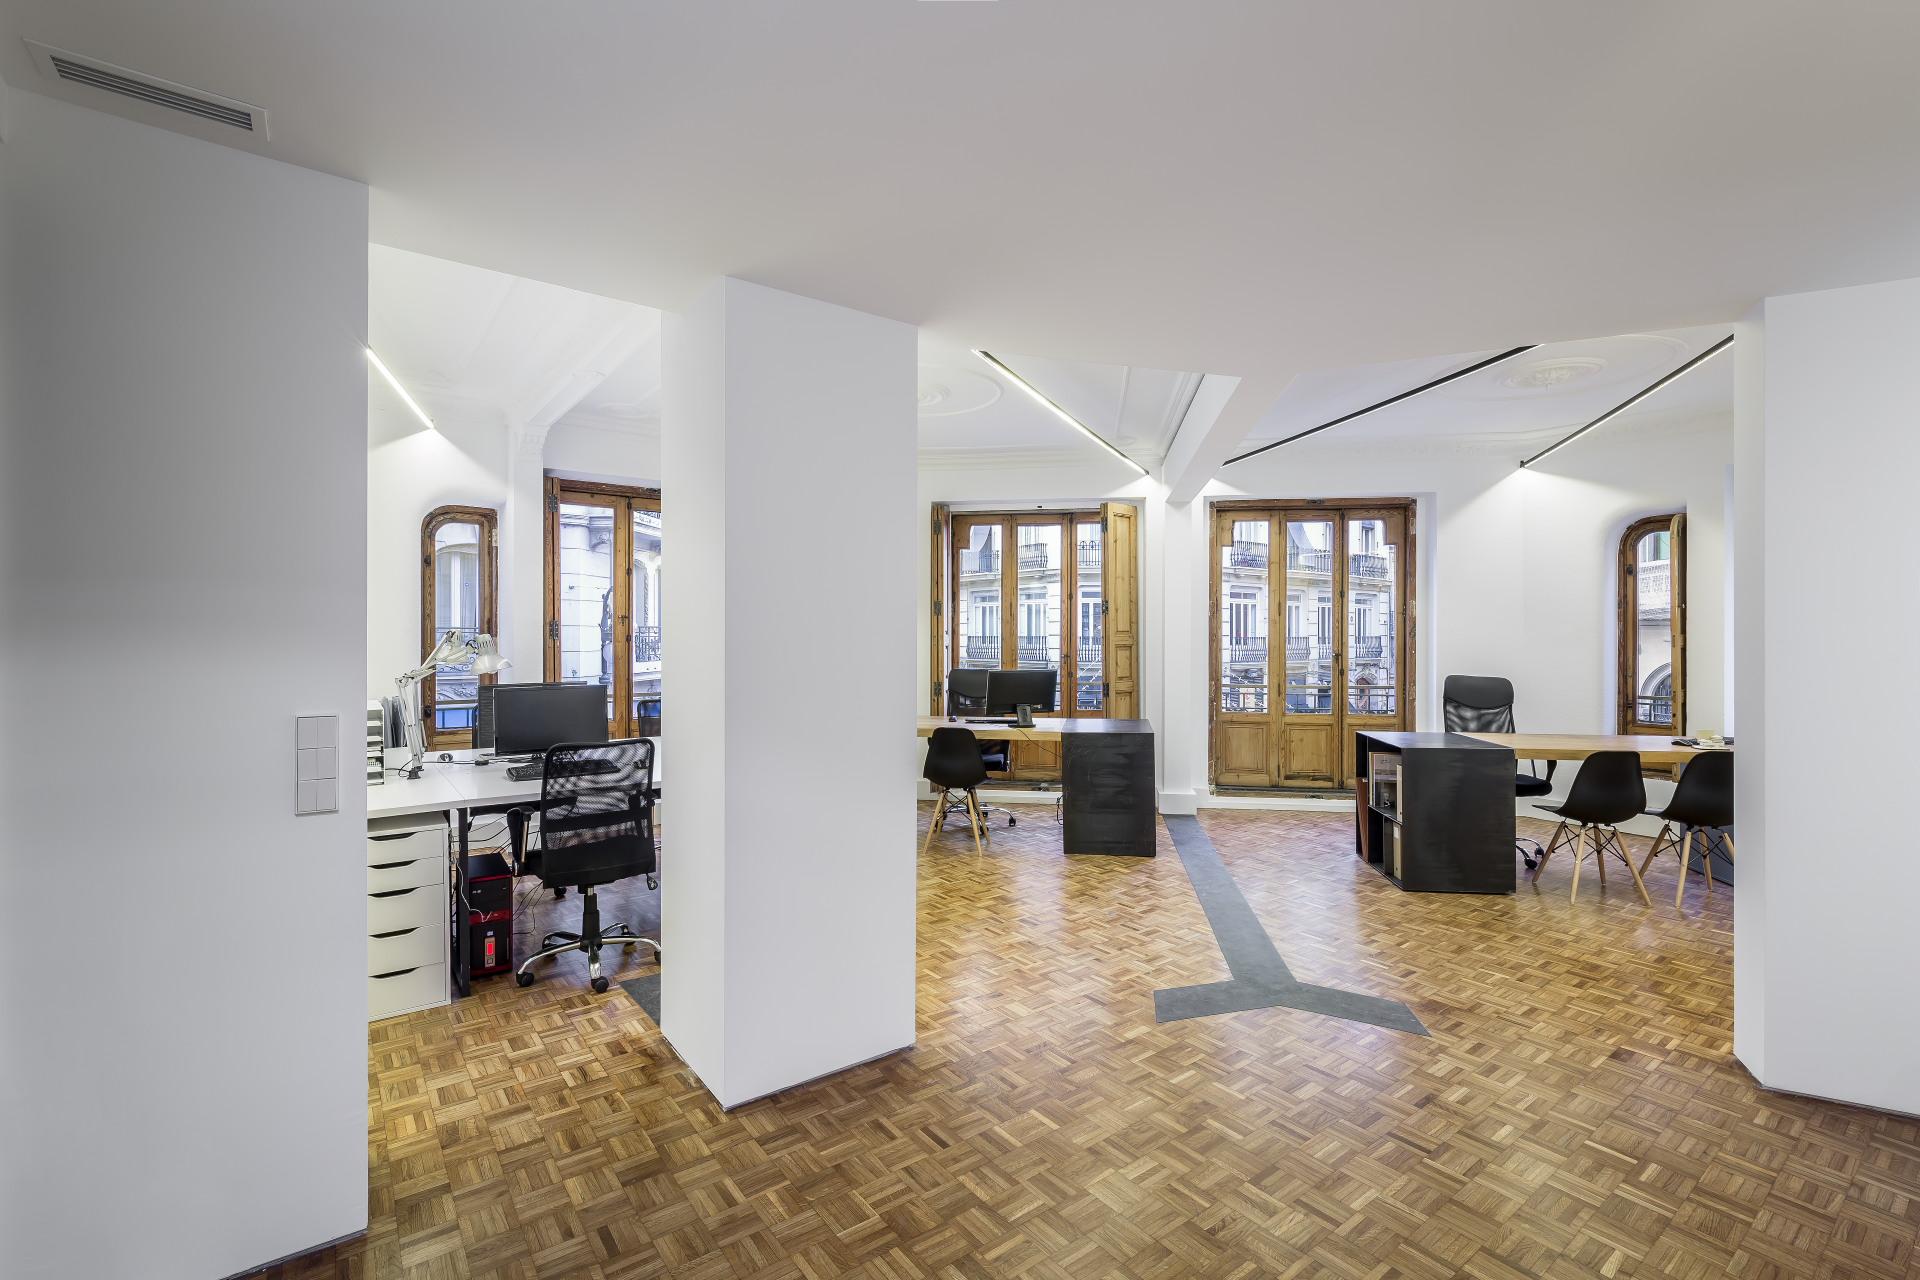 fotografia-arquitectura-interiorismo-valencia-german-cabo-viraje-estudio-pujol (1)